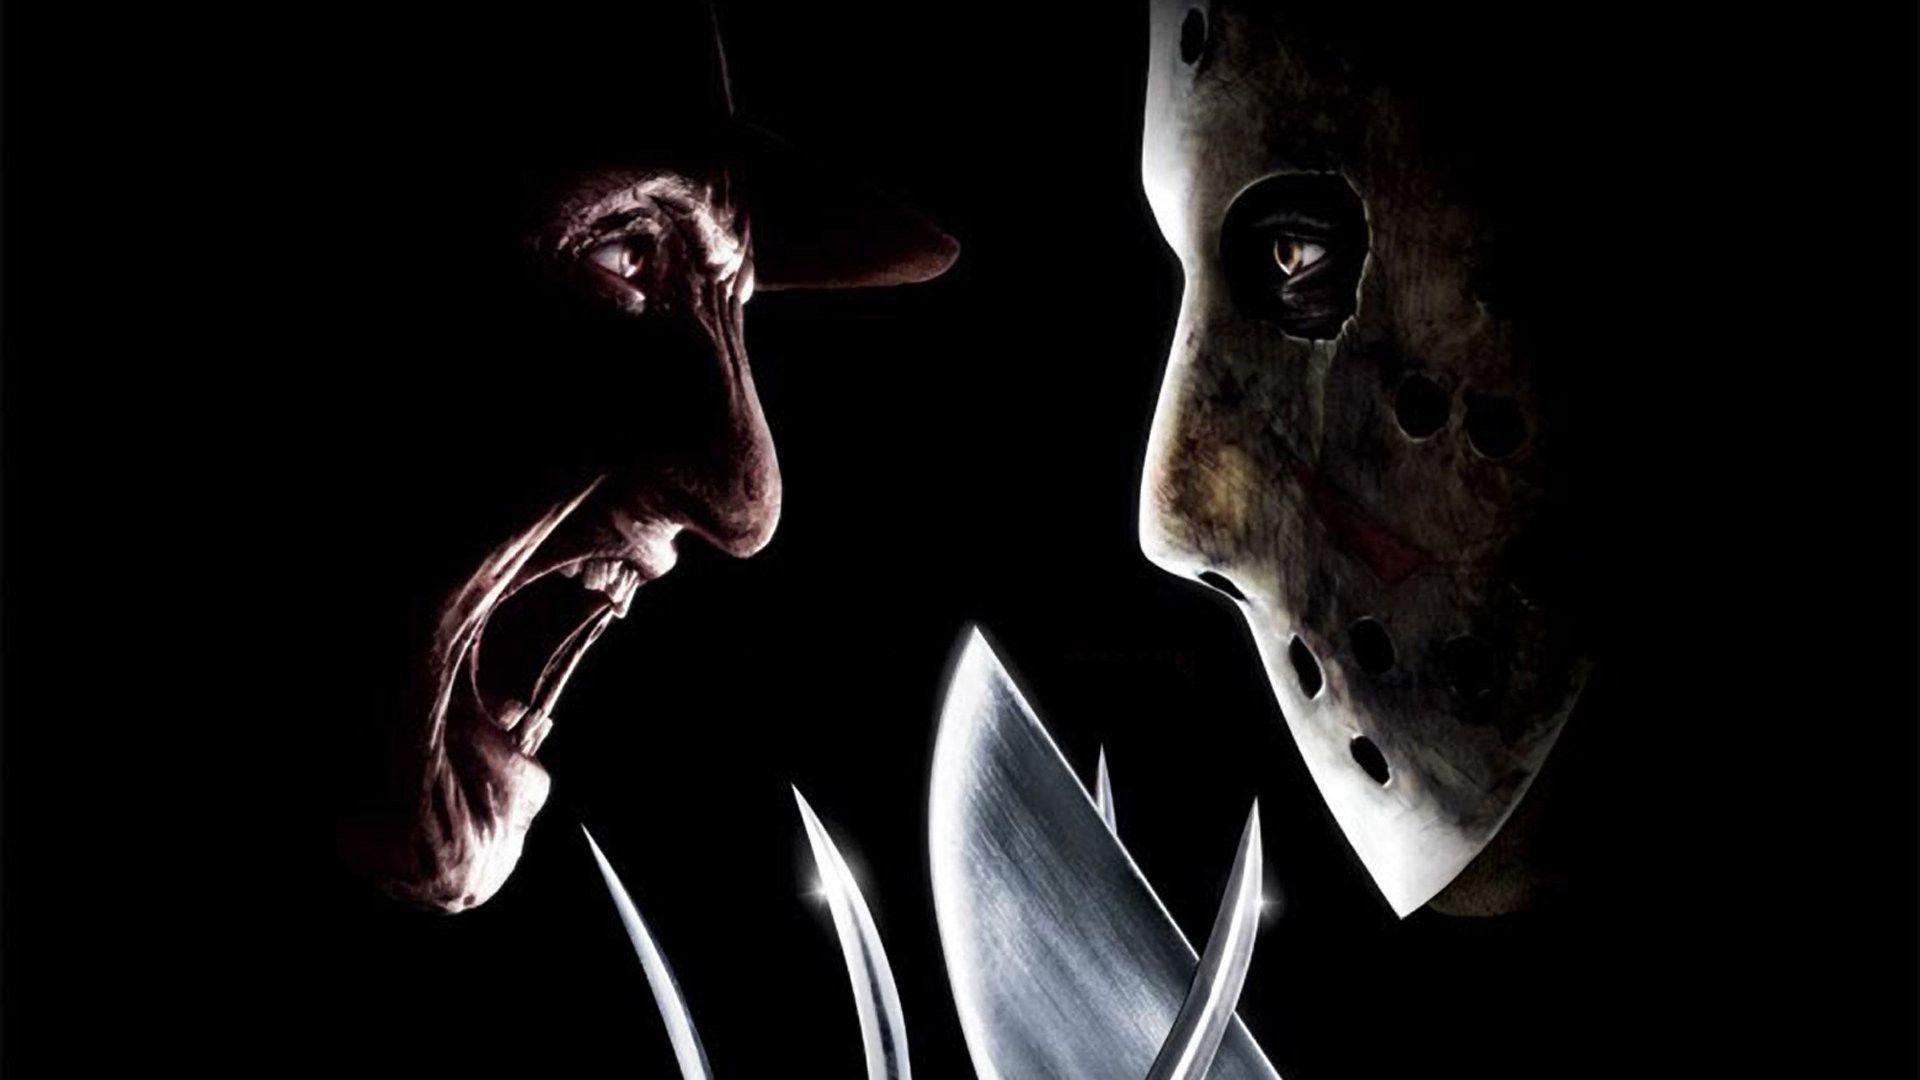 Movie Freddy Vs. Jason wallpapers freddy vs jason – Taringa!